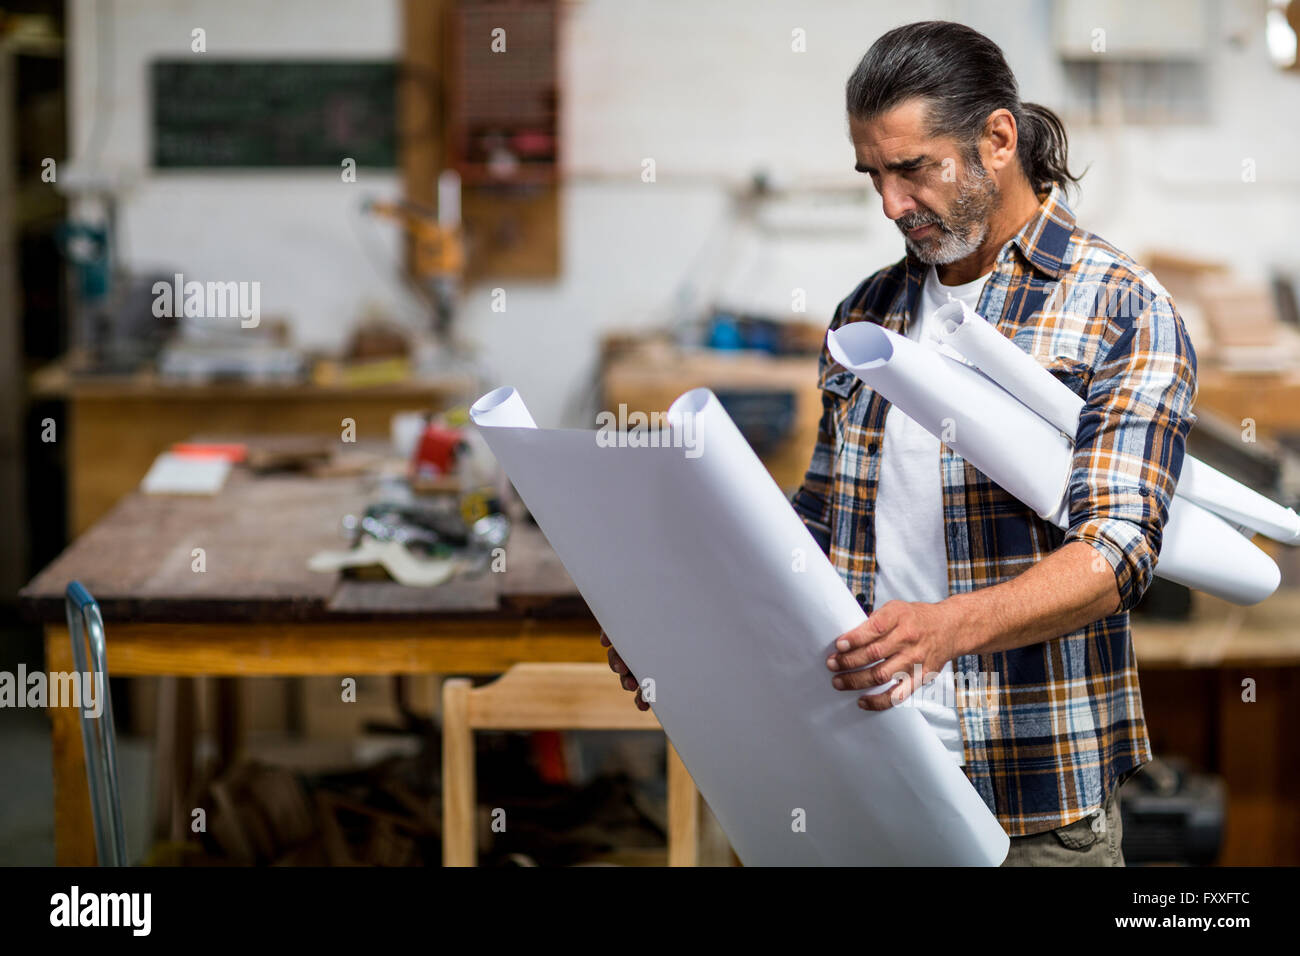 Carpenter looking at a blueprint - Stock Image